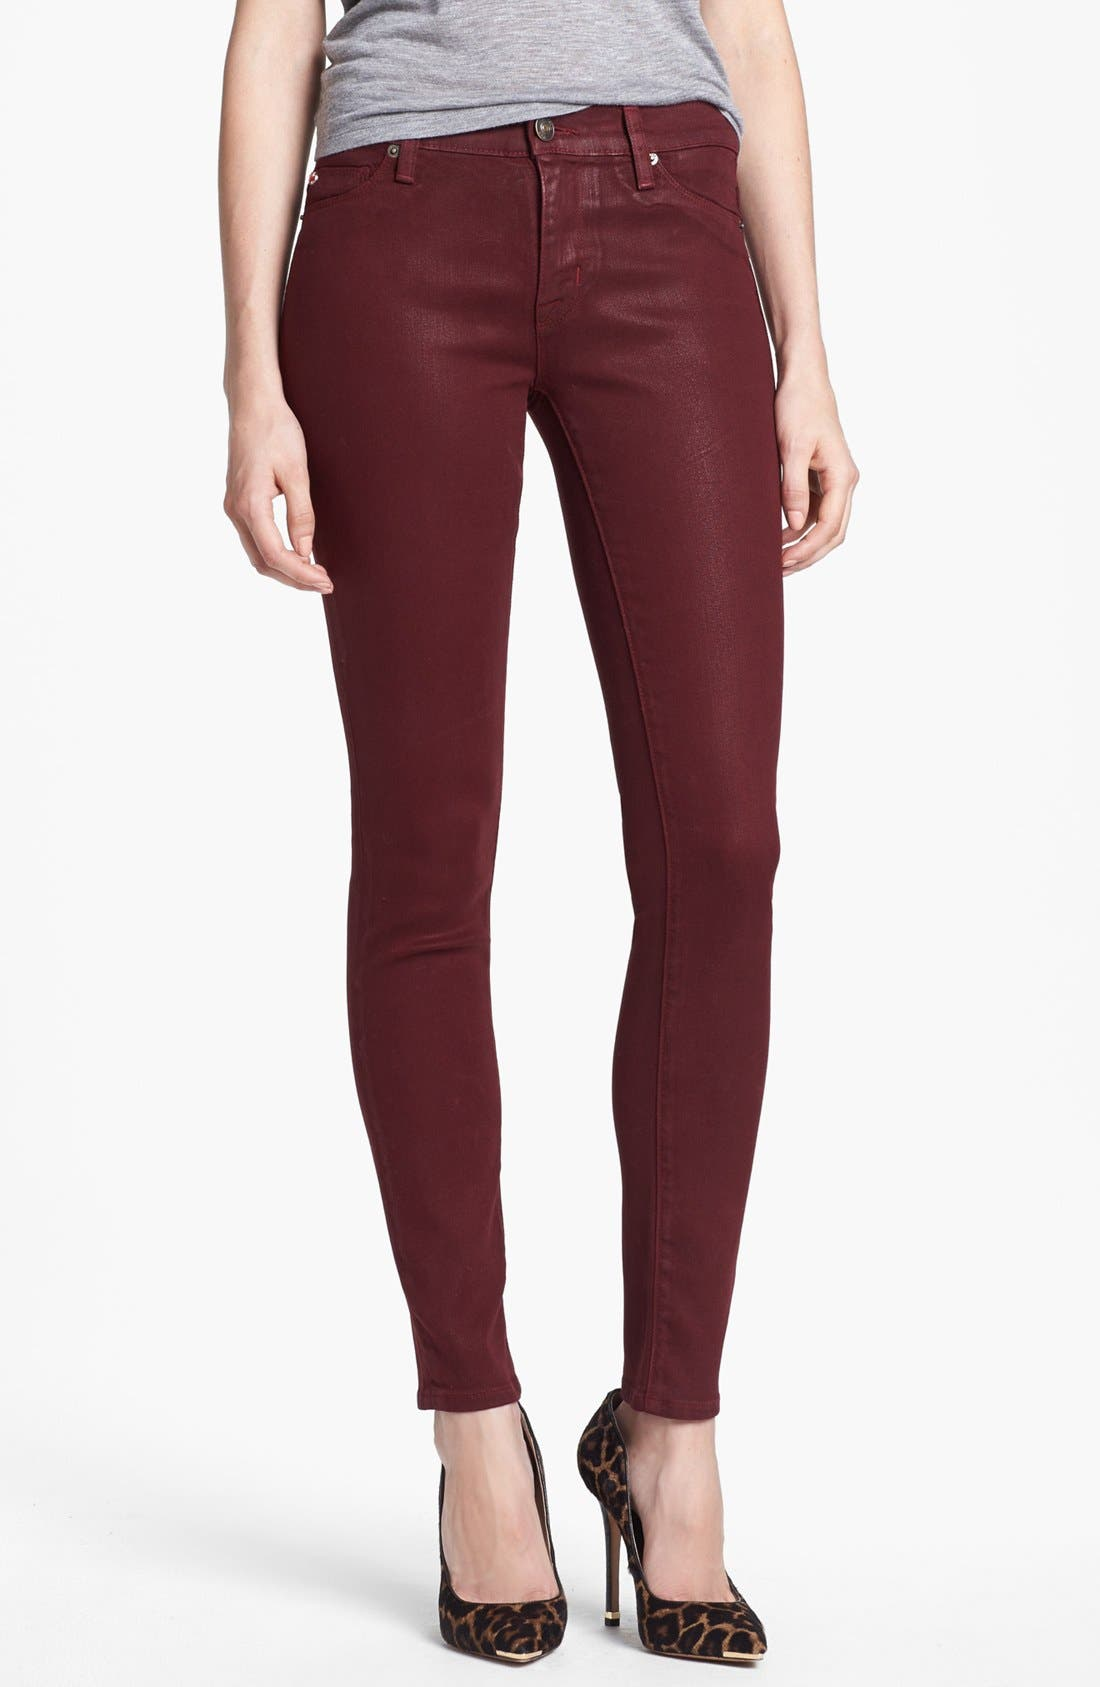 Main Image - Hudson Jeans 'Krista' Super Skinny Jeans (Crimson Wax)